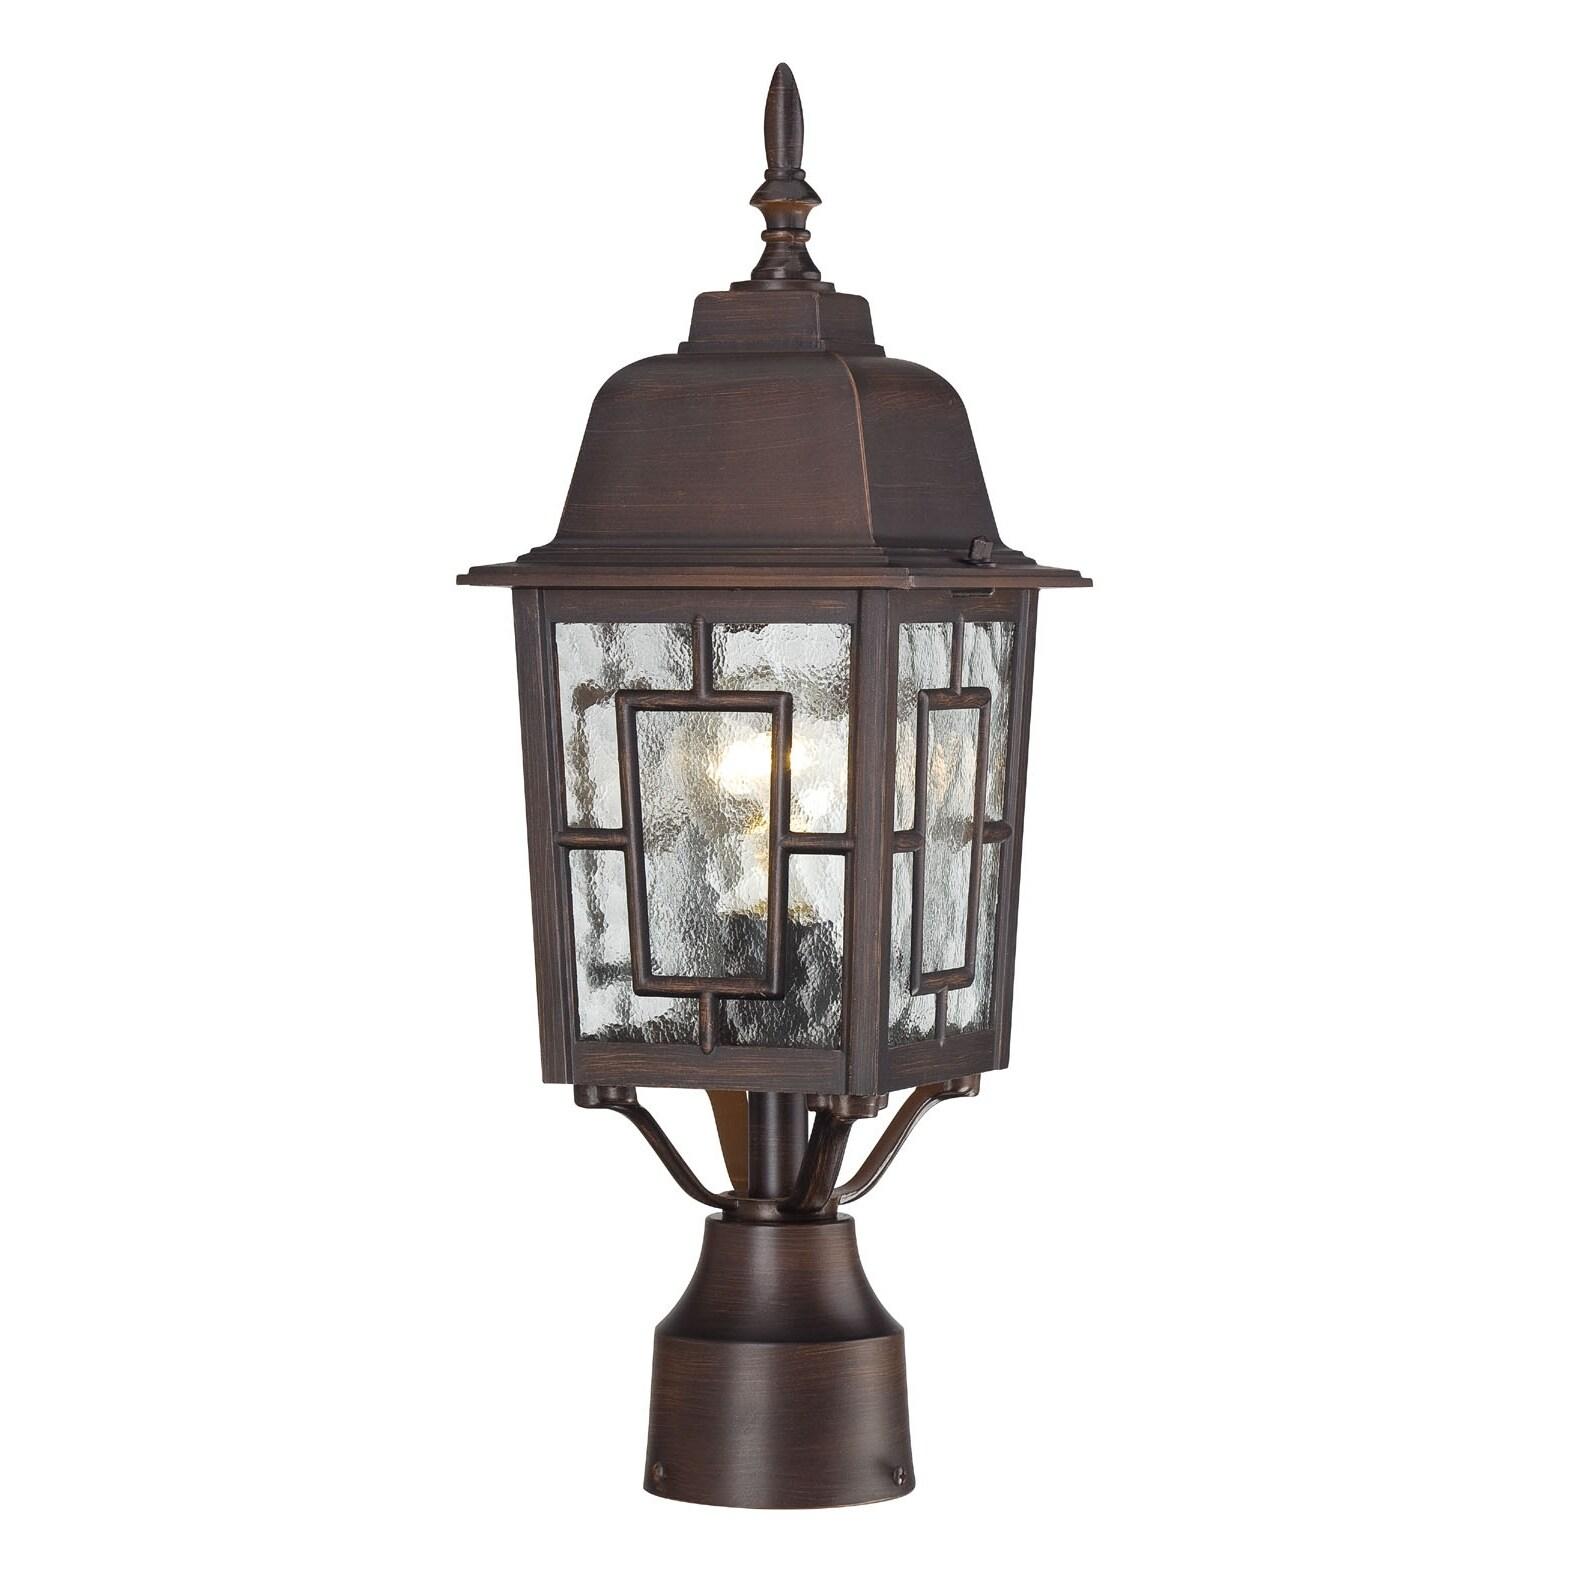 Nuvo Banyon 1-light Rustic Bronze 17-inch Post Fixture